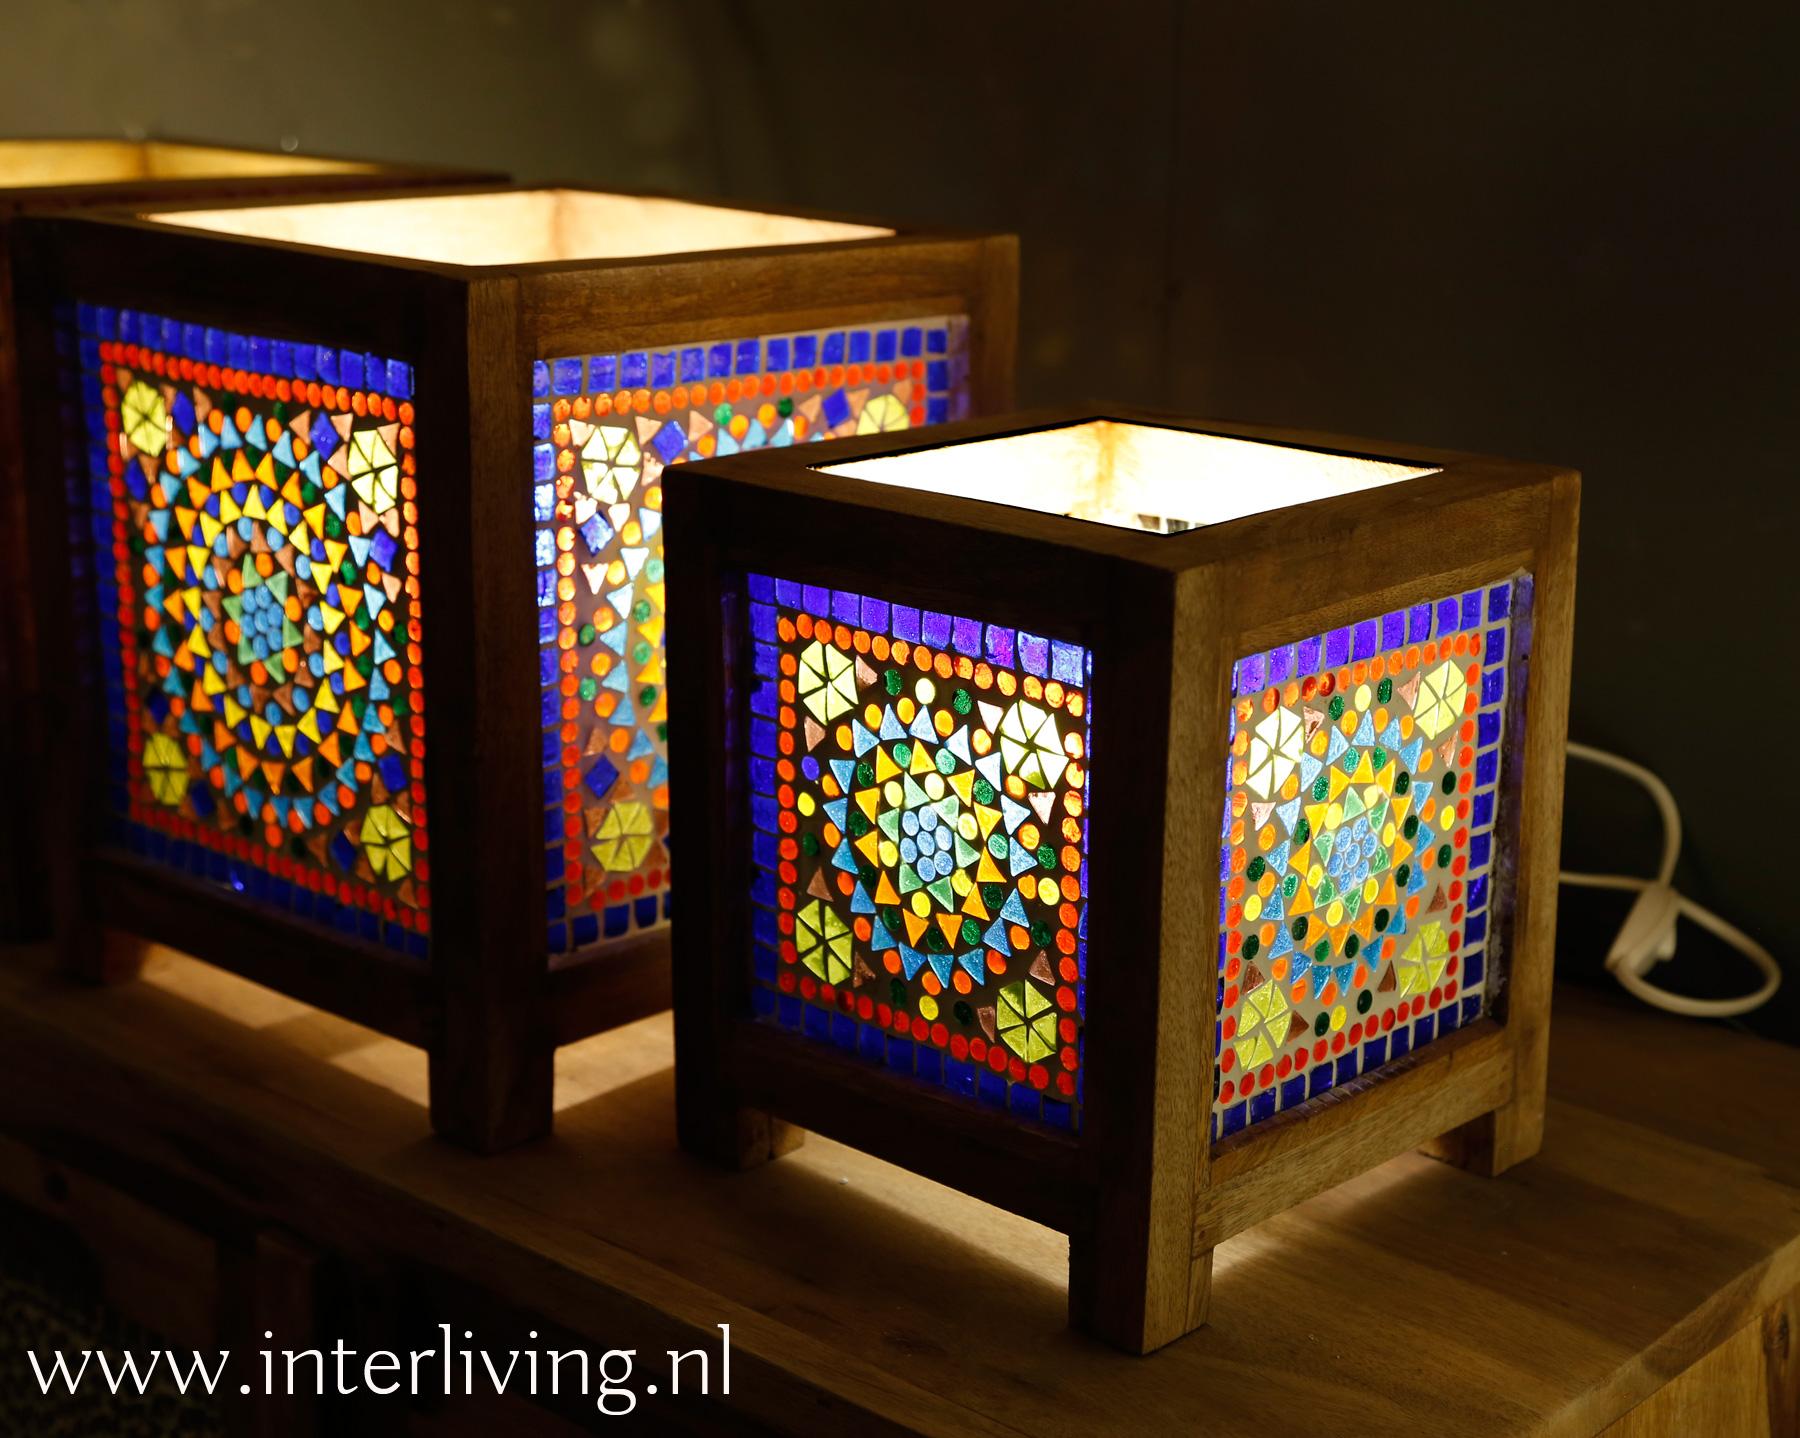 tafellampje open bovenkant hout met glas - Bohemian stijl - kleurrijk wonen styling voor Ibiza & Boho chic interieur